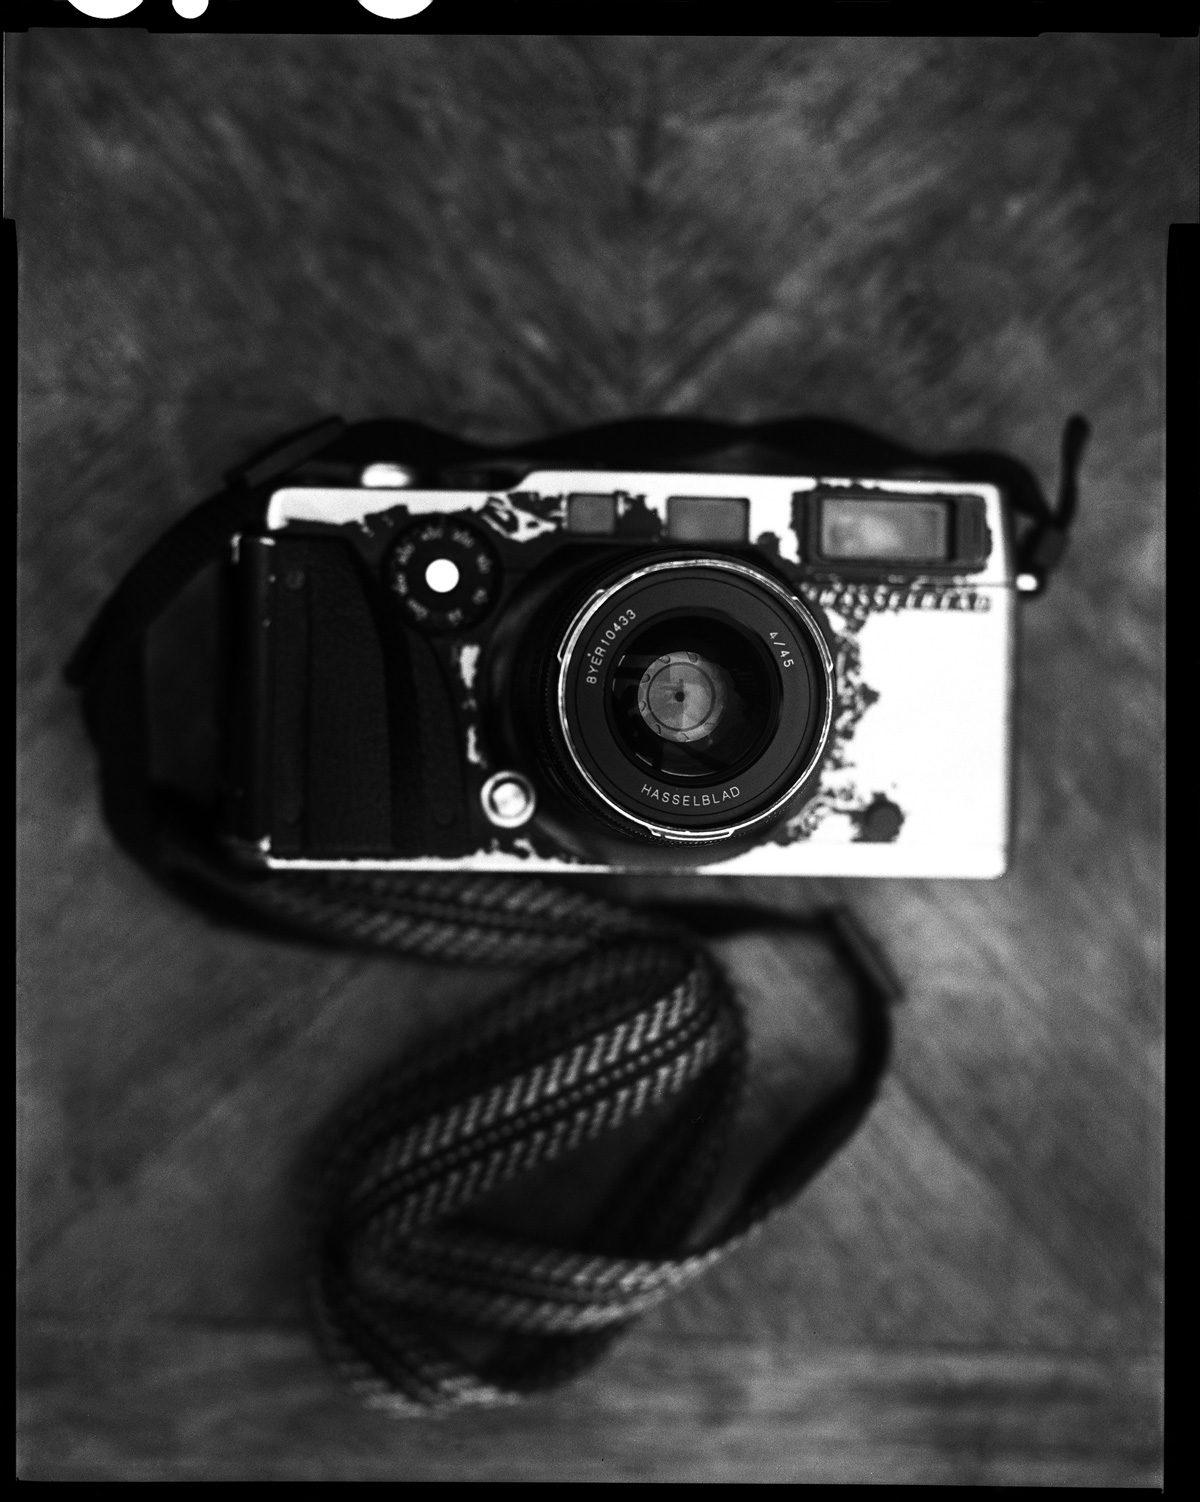 Hasselblad-Xpan-camera